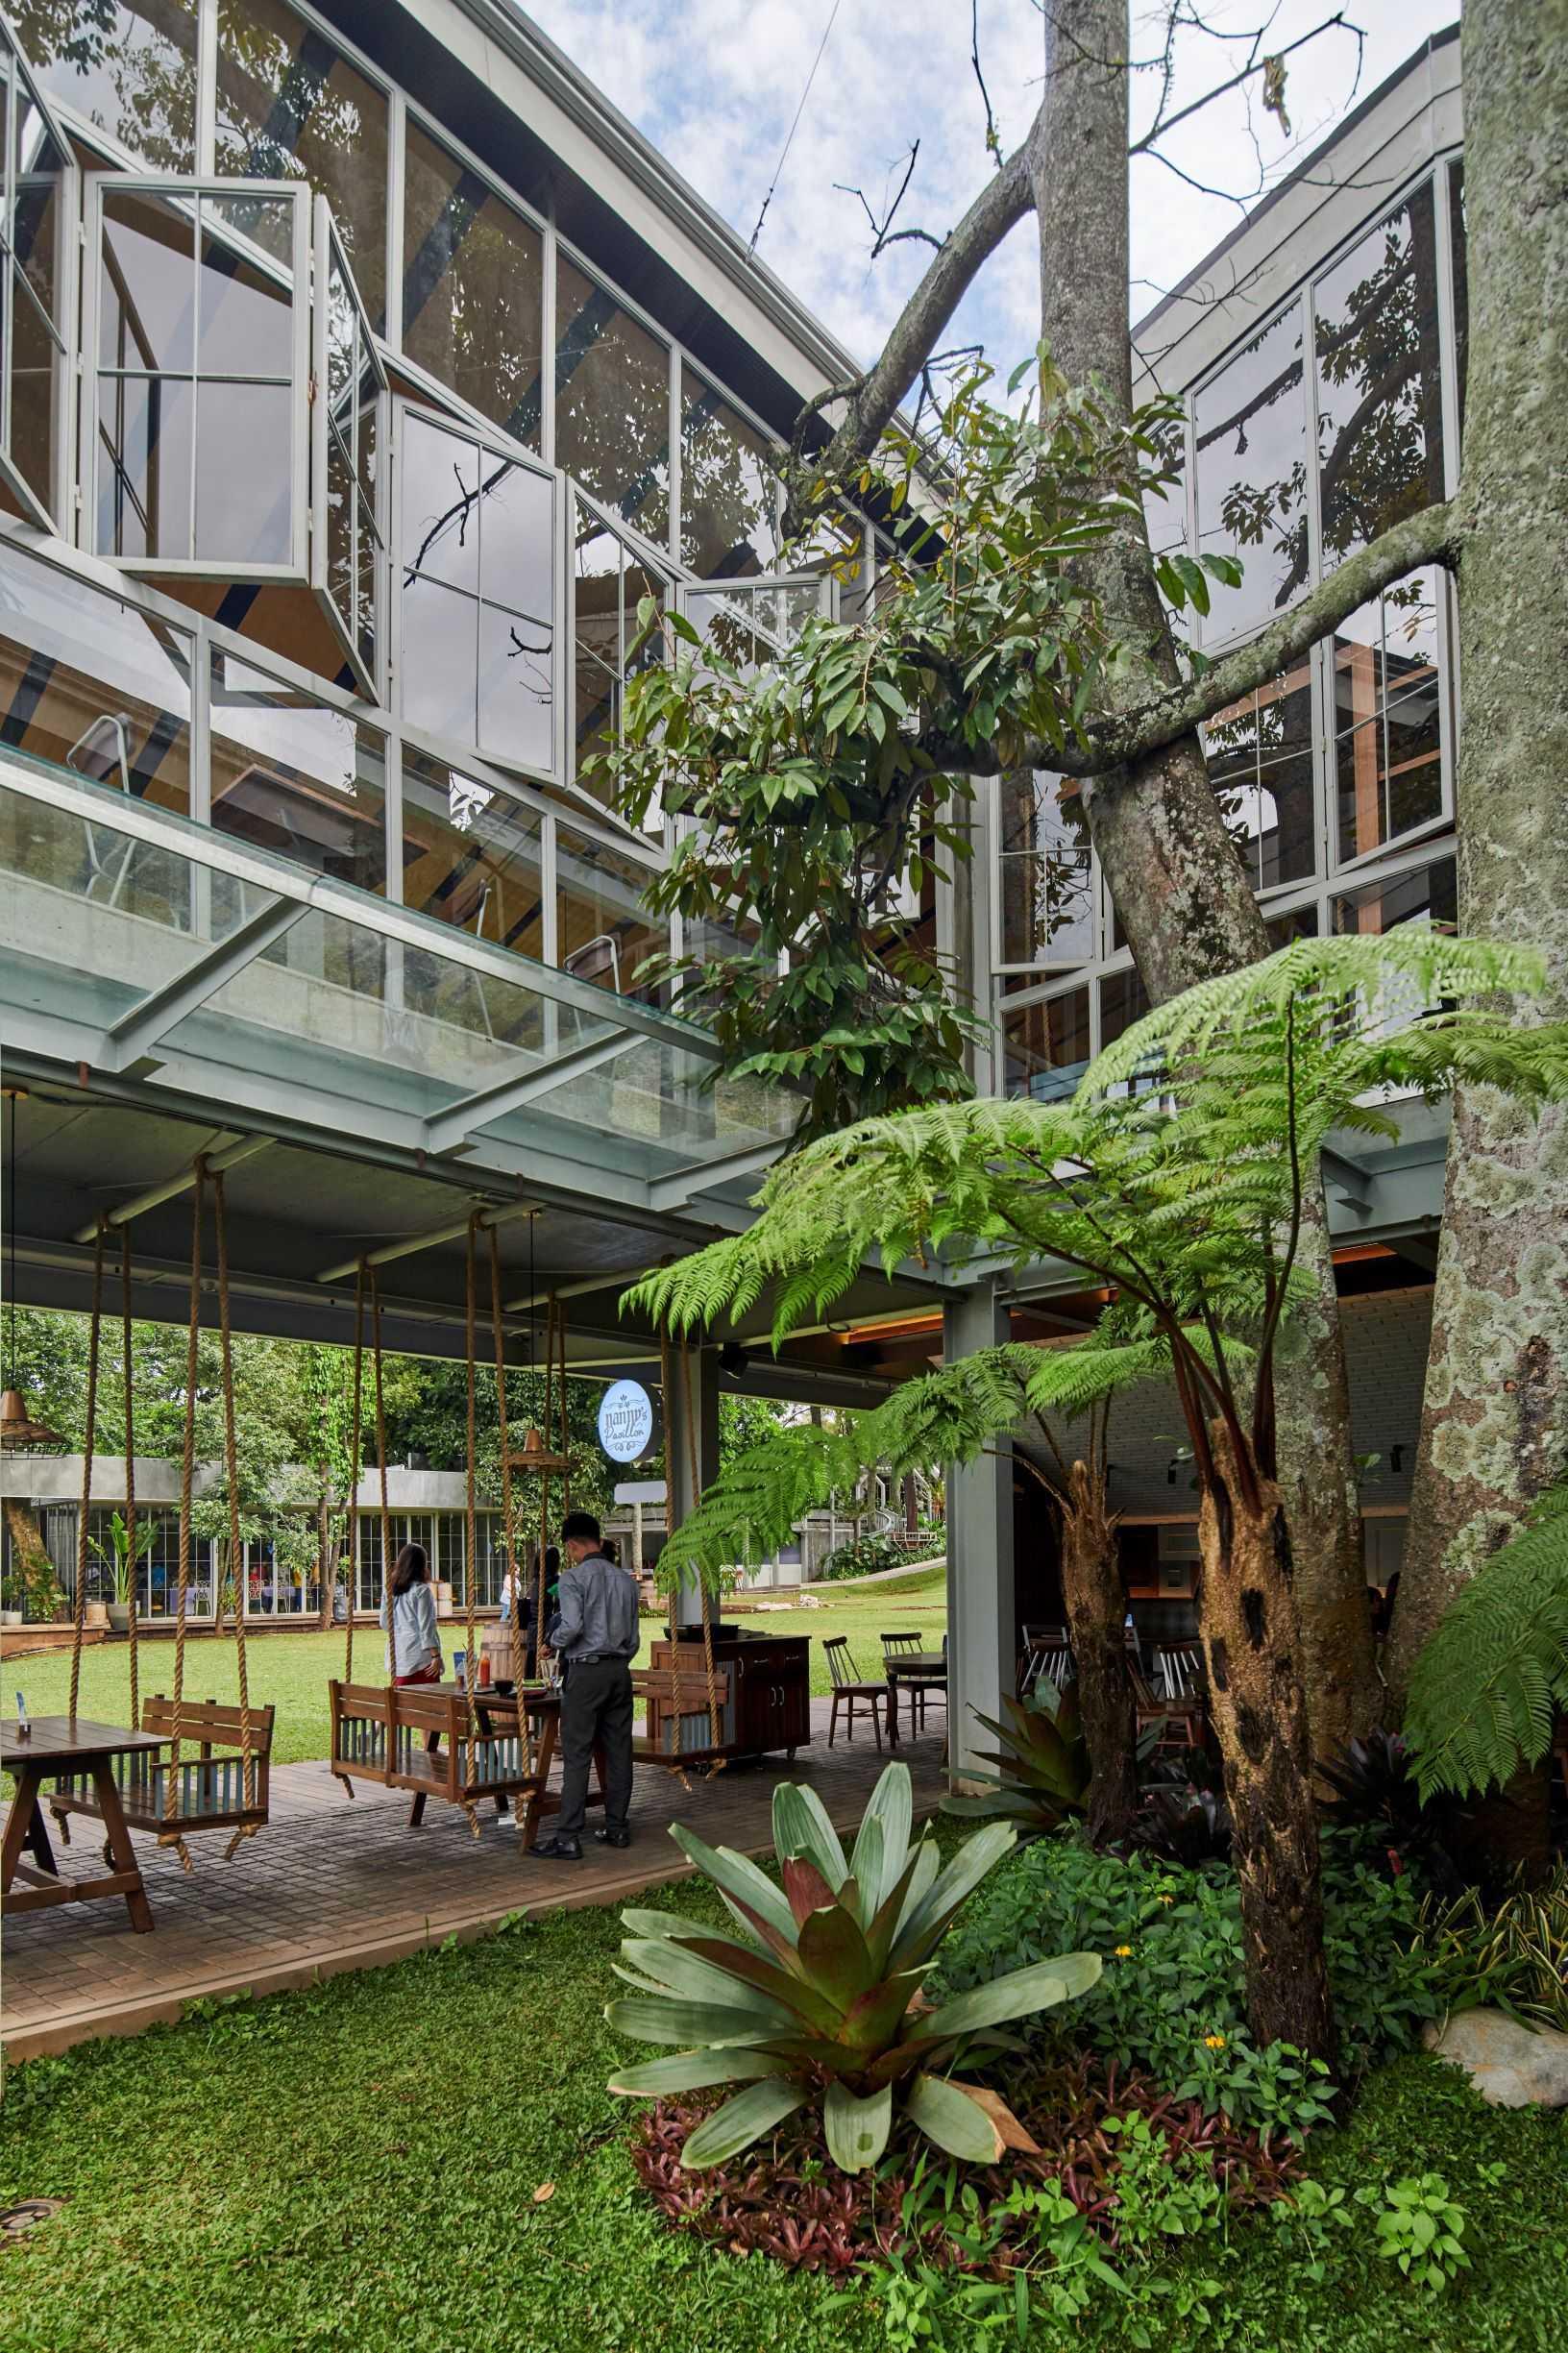 Hadivincent Architects Nara Park Ciumbuleuit, Cidadap, Kota Bandung, Jawa Barat, Indonesia Ciumbuleuit, Cidadap, Kota Bandung, Jawa Barat, Indonesia Hadivincent-Architects-Nara-Park   71552